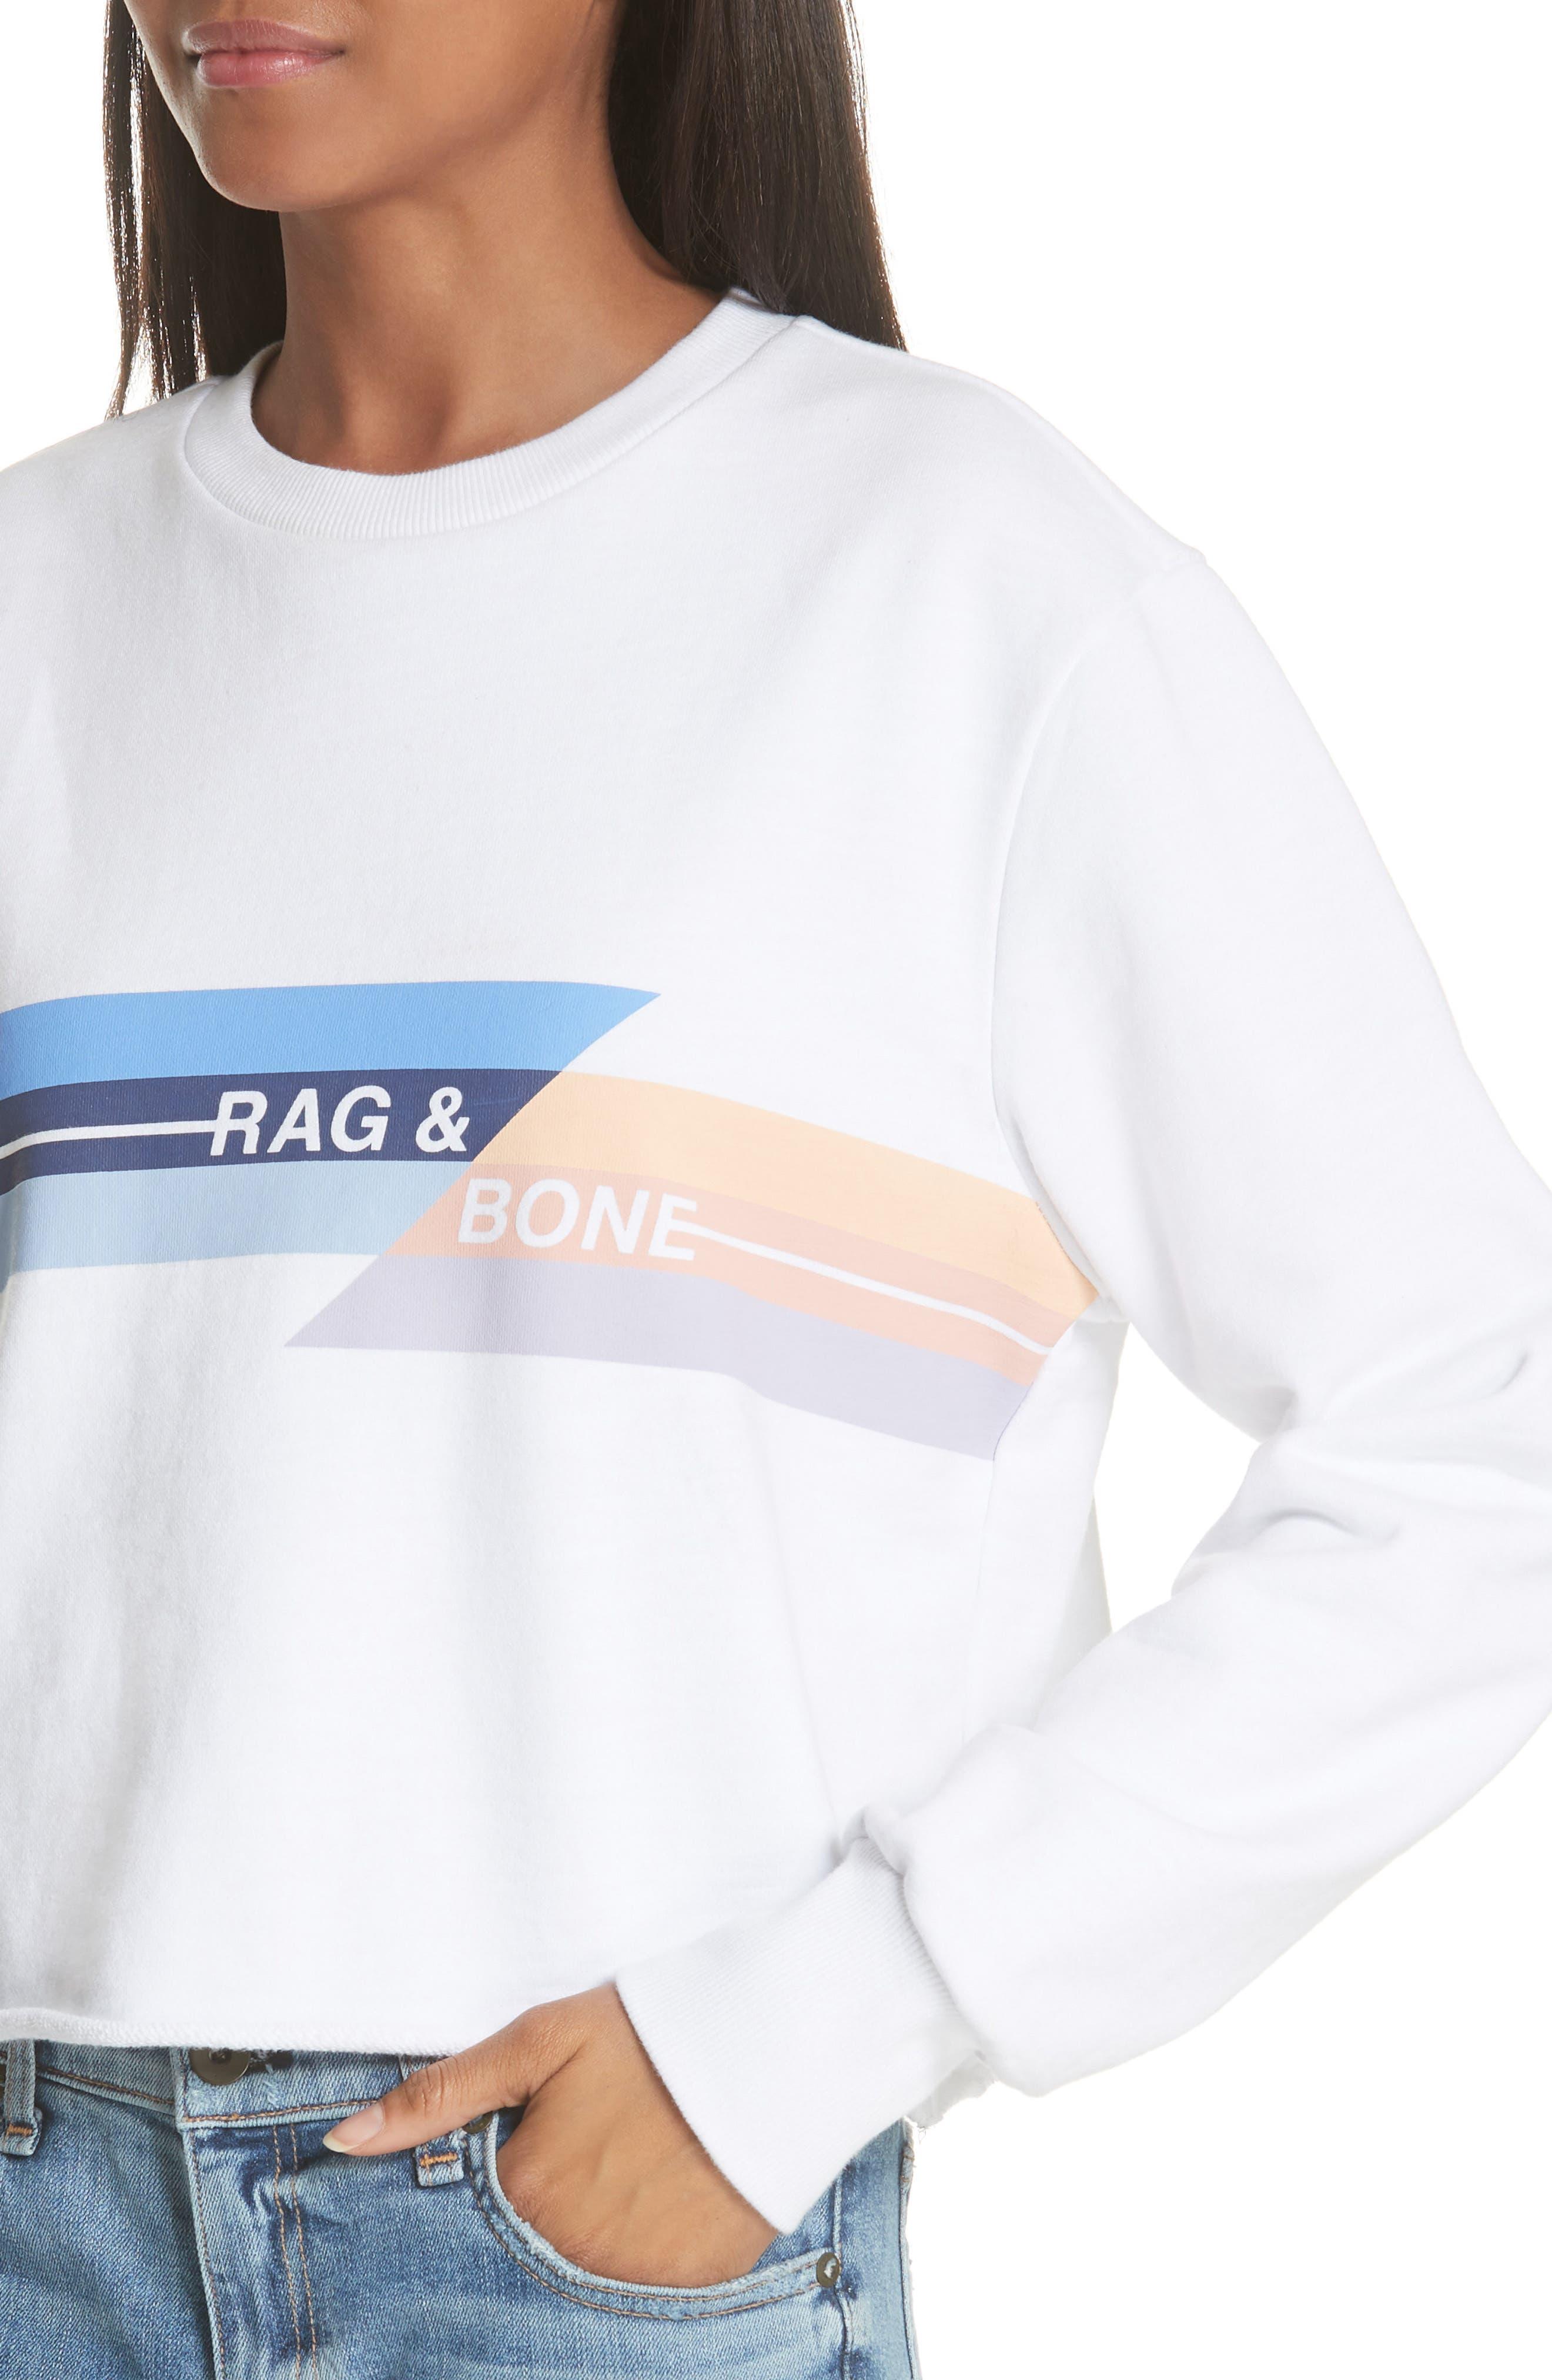 JEAN Glitch Crop Sweatshirt,                             Alternate thumbnail 4, color,                             100